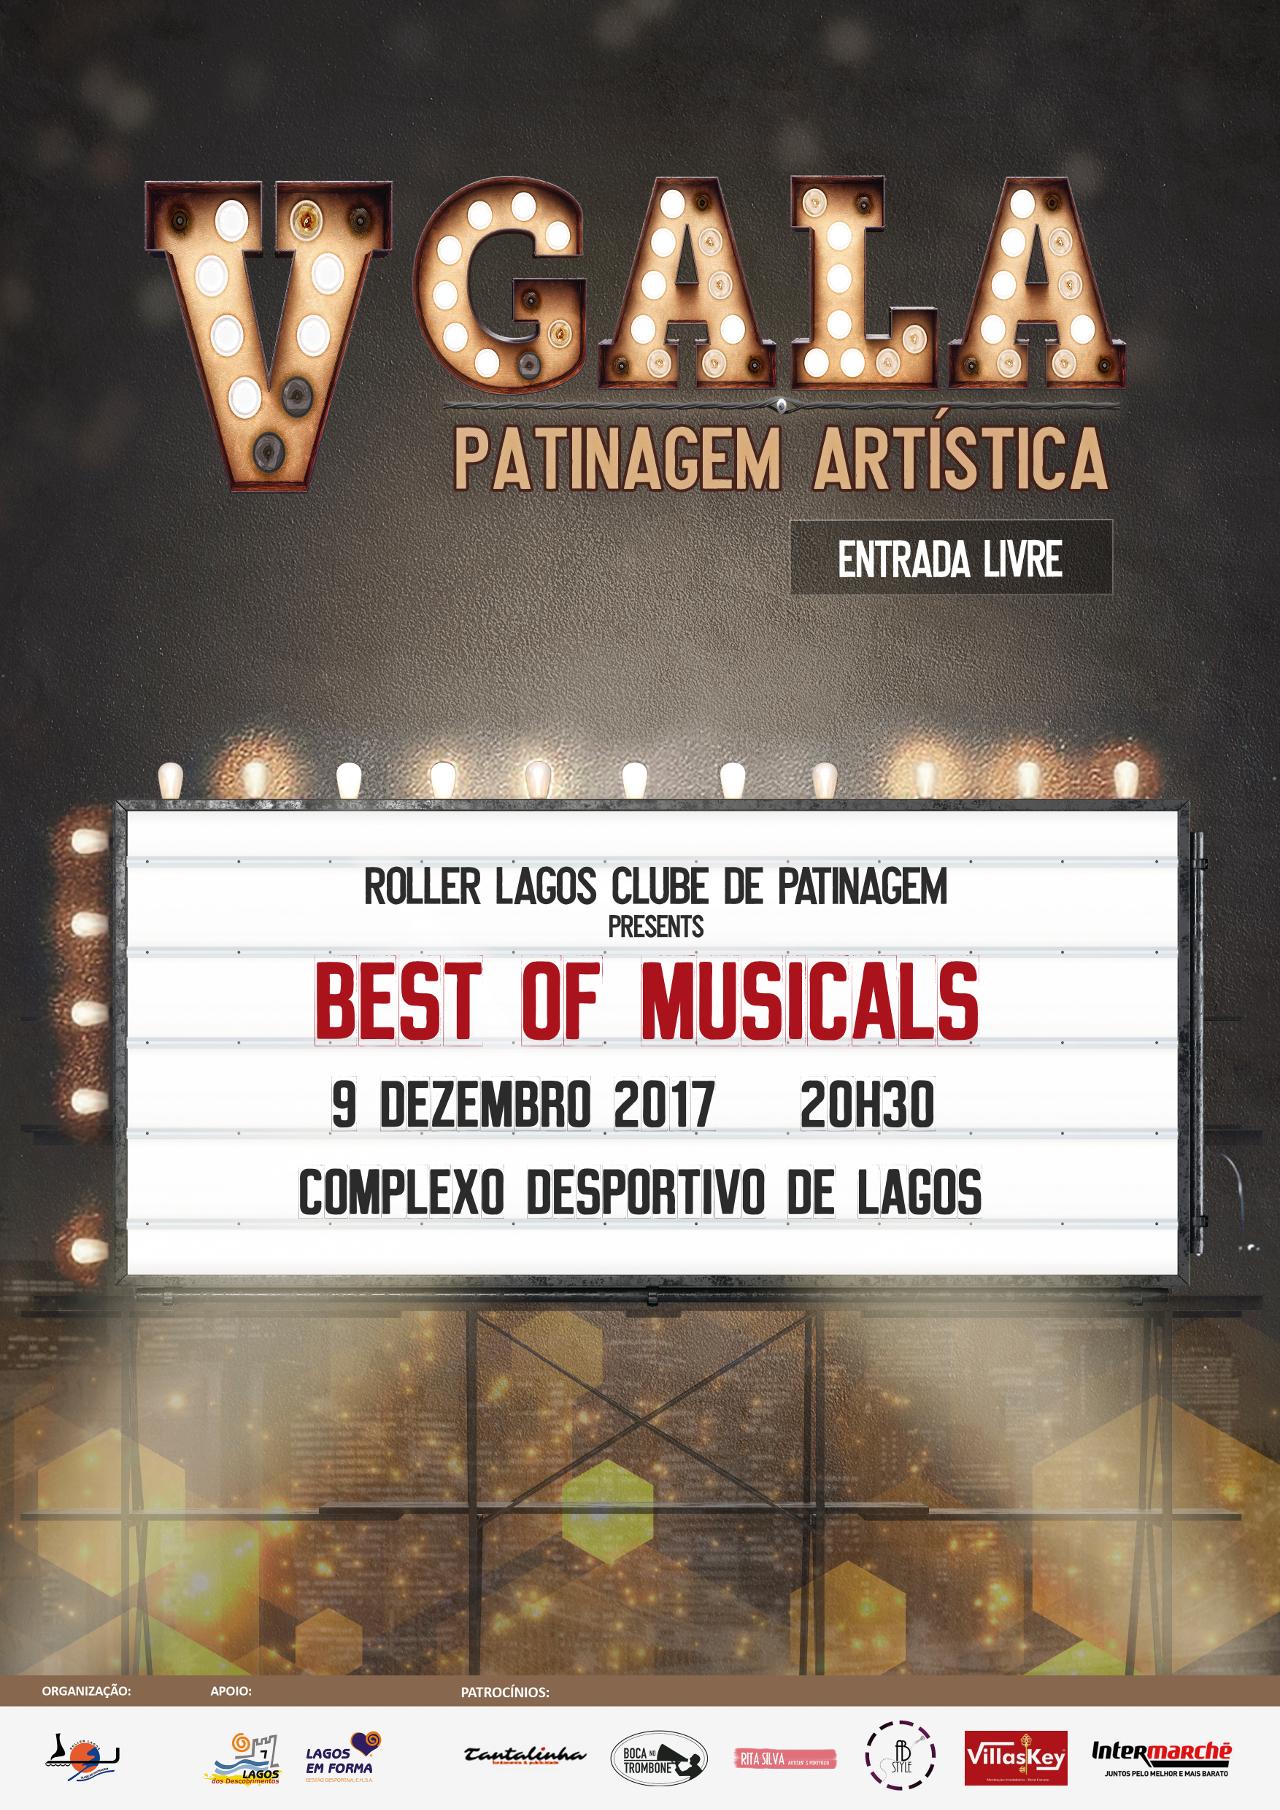 V Gala Patinagem Artistica Cartaz VGala 2017 RLCP